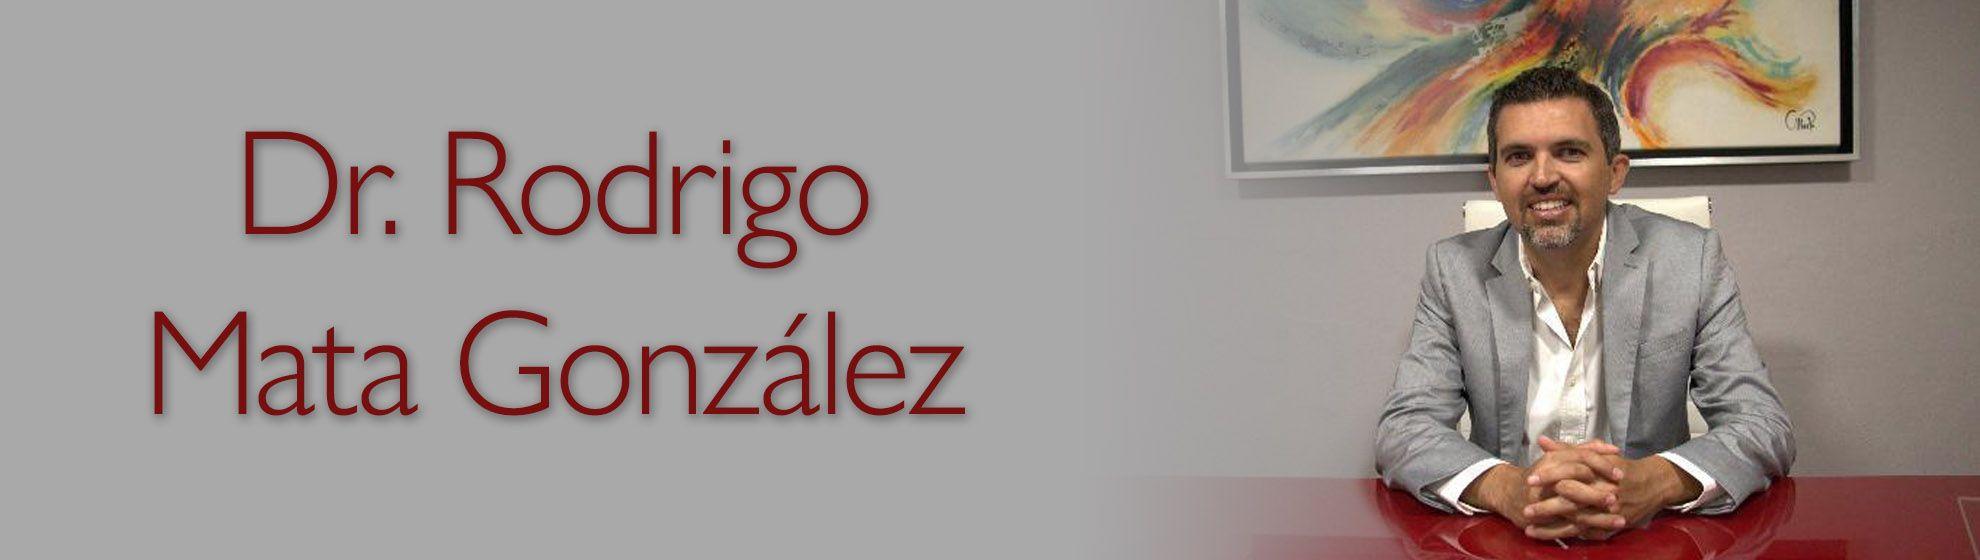 Dr. Rodrigo Mata González